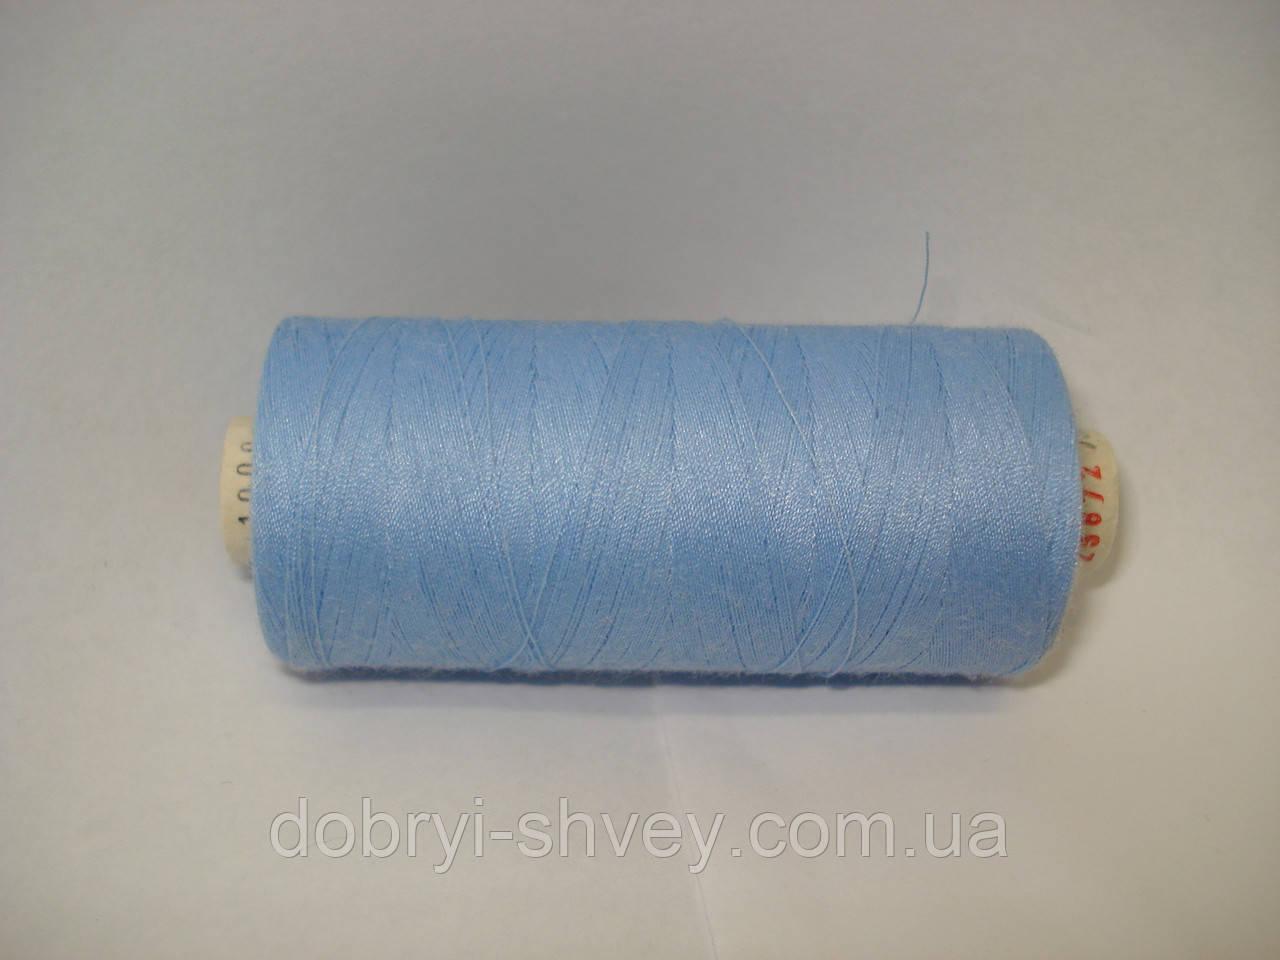 Нитка ALTERFIL №120 1000м.col 25872 насыщенно-голубой